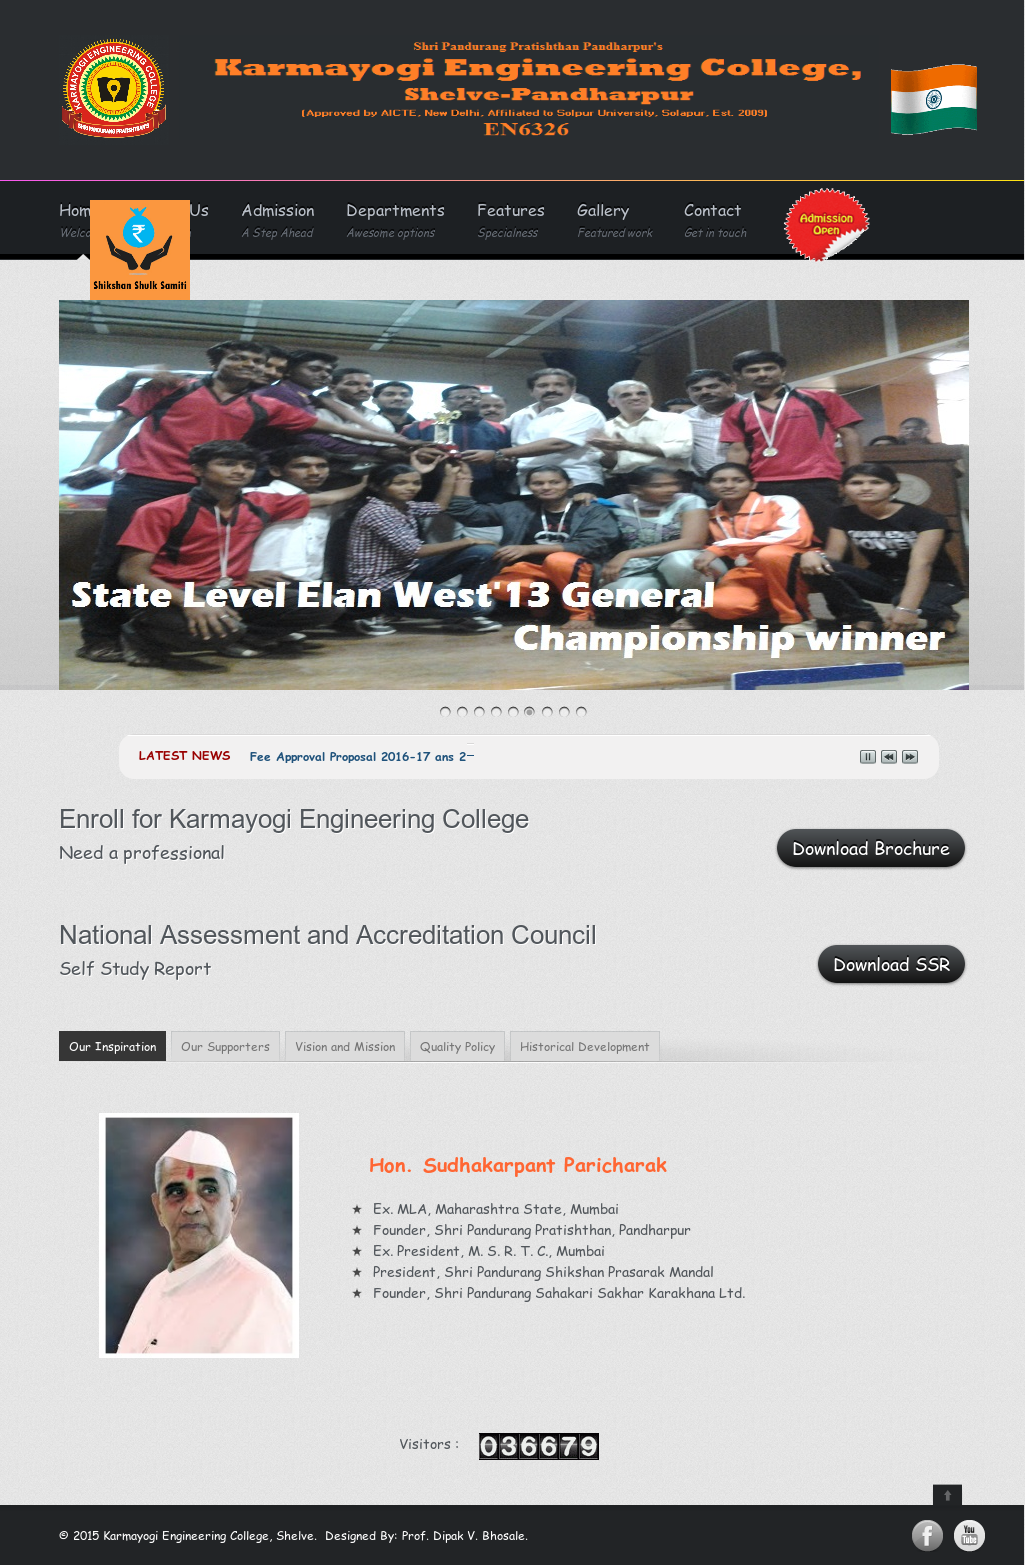 Pandharpur website